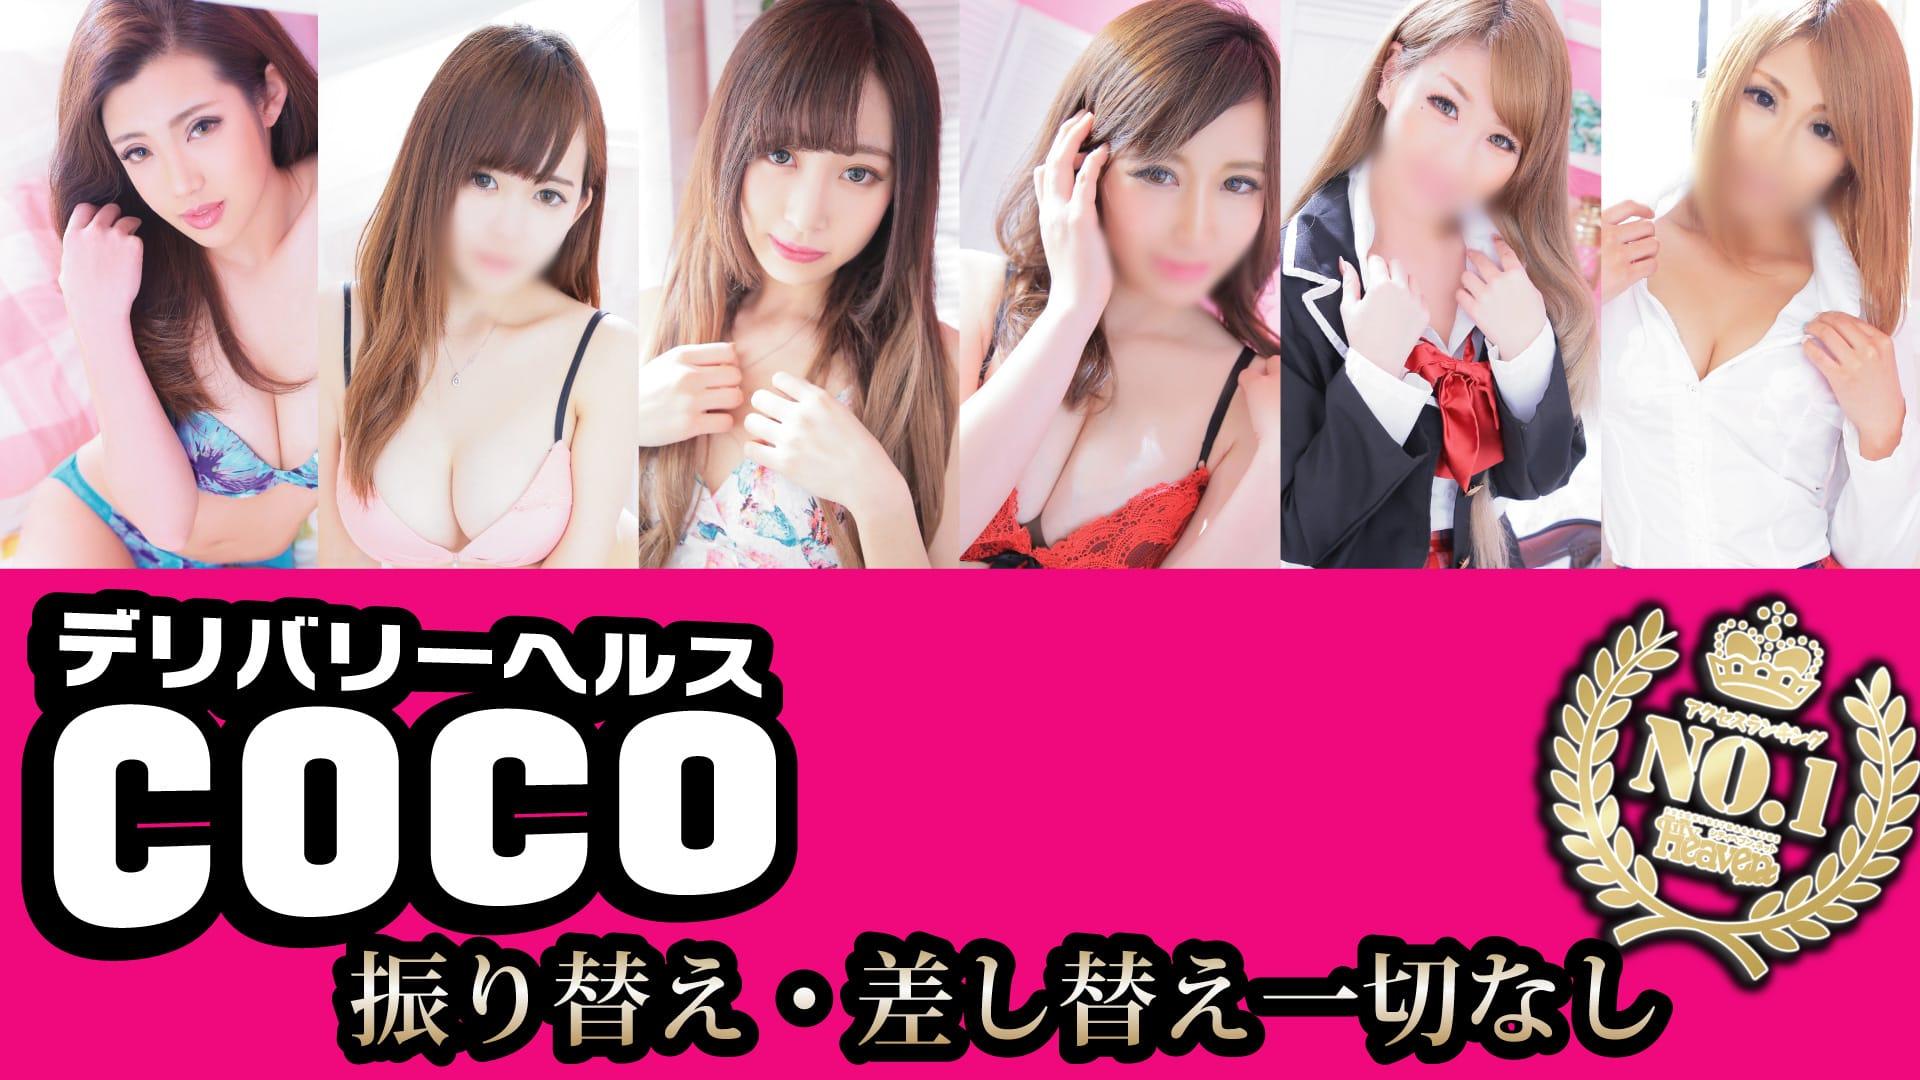 COCO ~ココ~